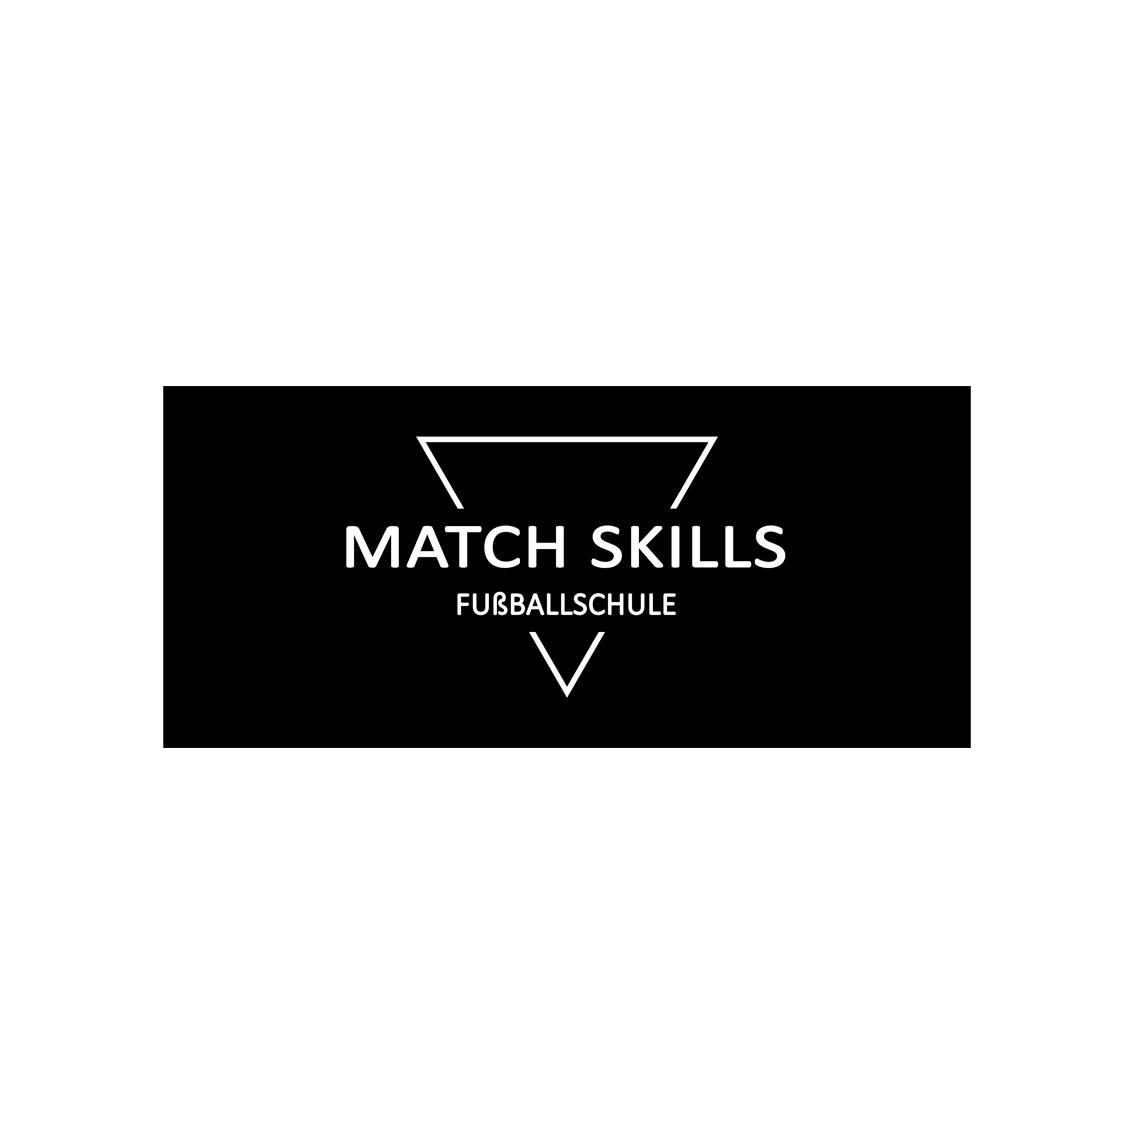 MATCH SKILLS Fußballschuhe